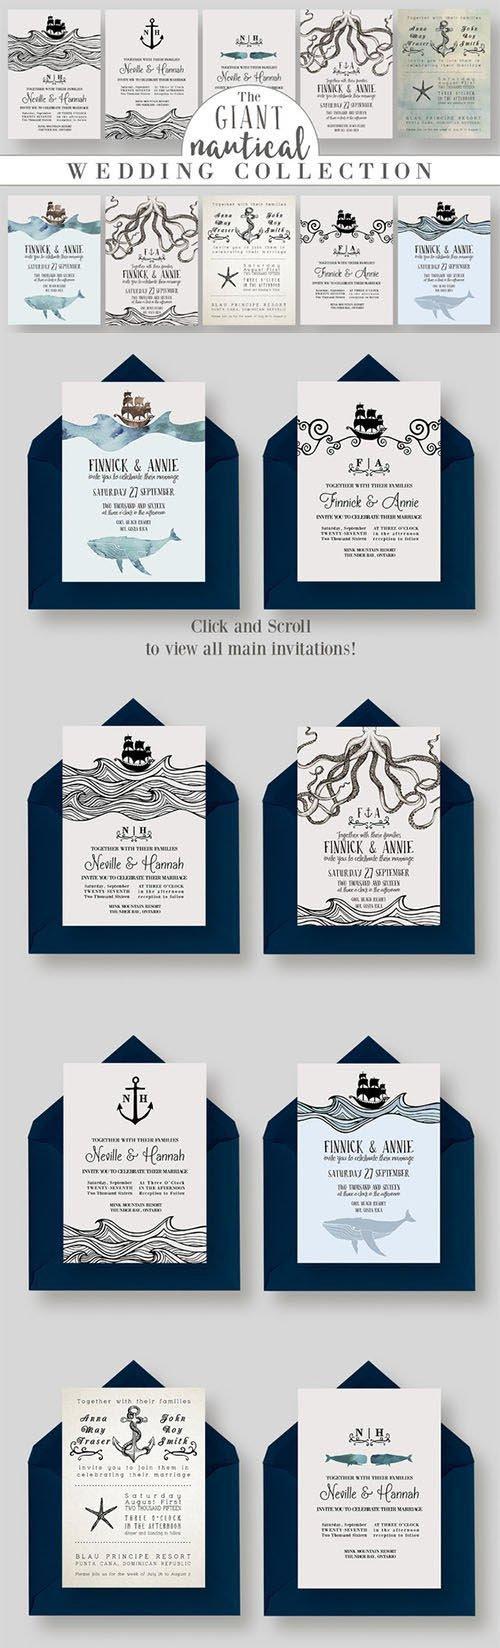 GIANT Nautical Wedding Collection - CM 340161